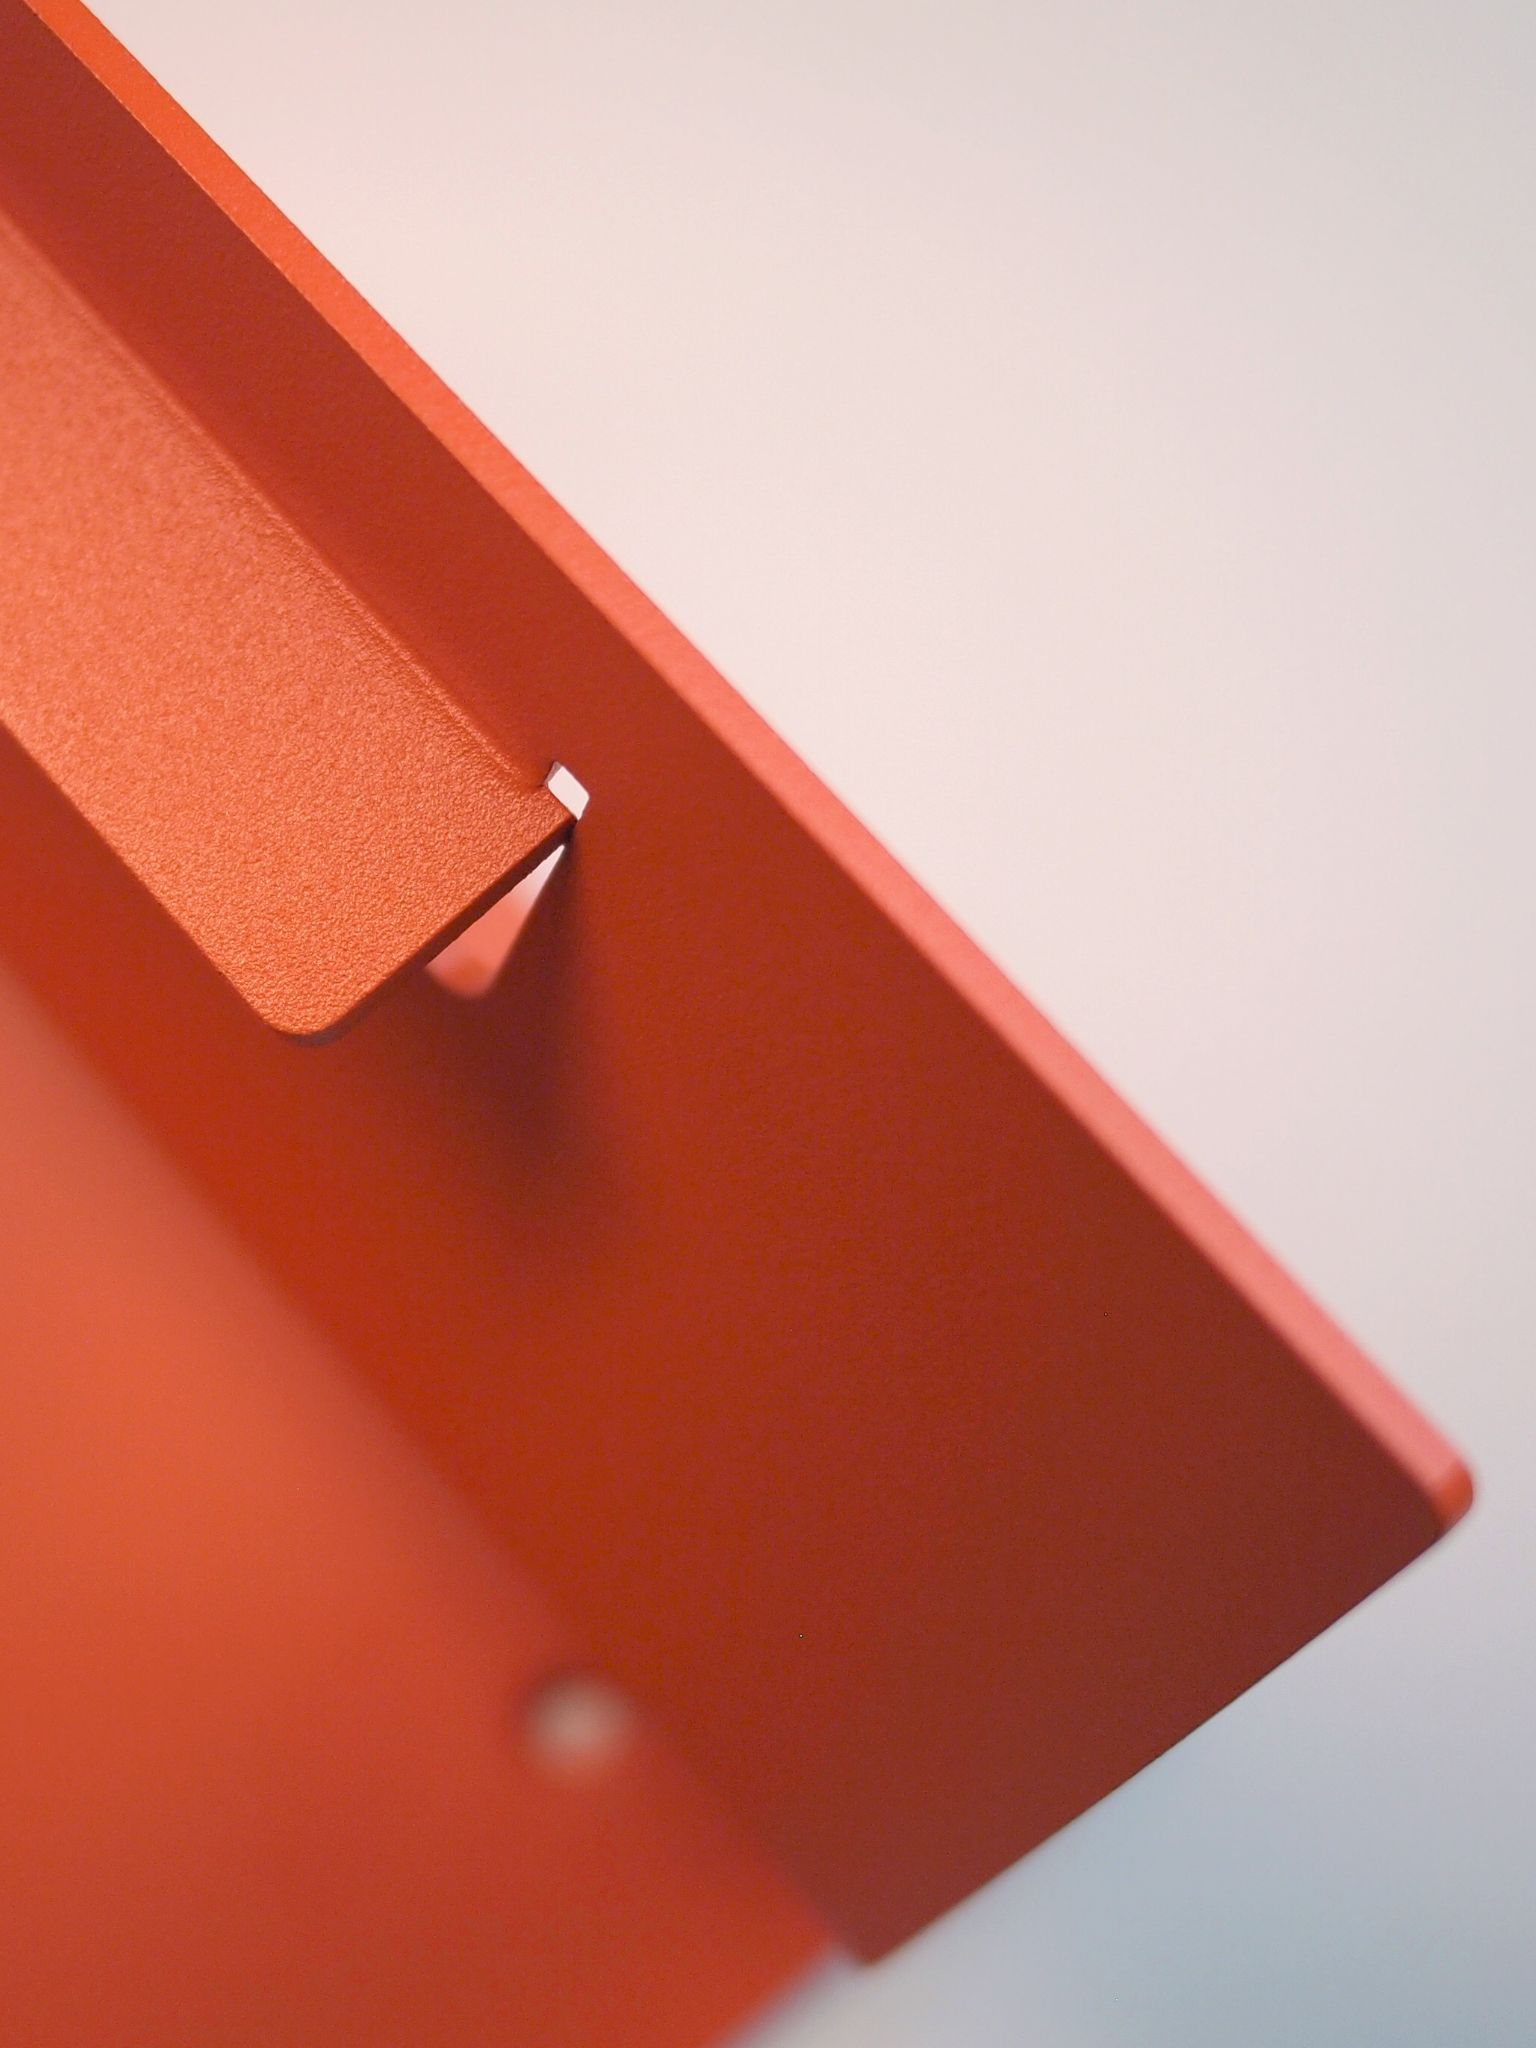 Detail Folded And Powder Coated Aluminium Sheet Sheet Metal Fabrication Metal Design Metal Sheet Design